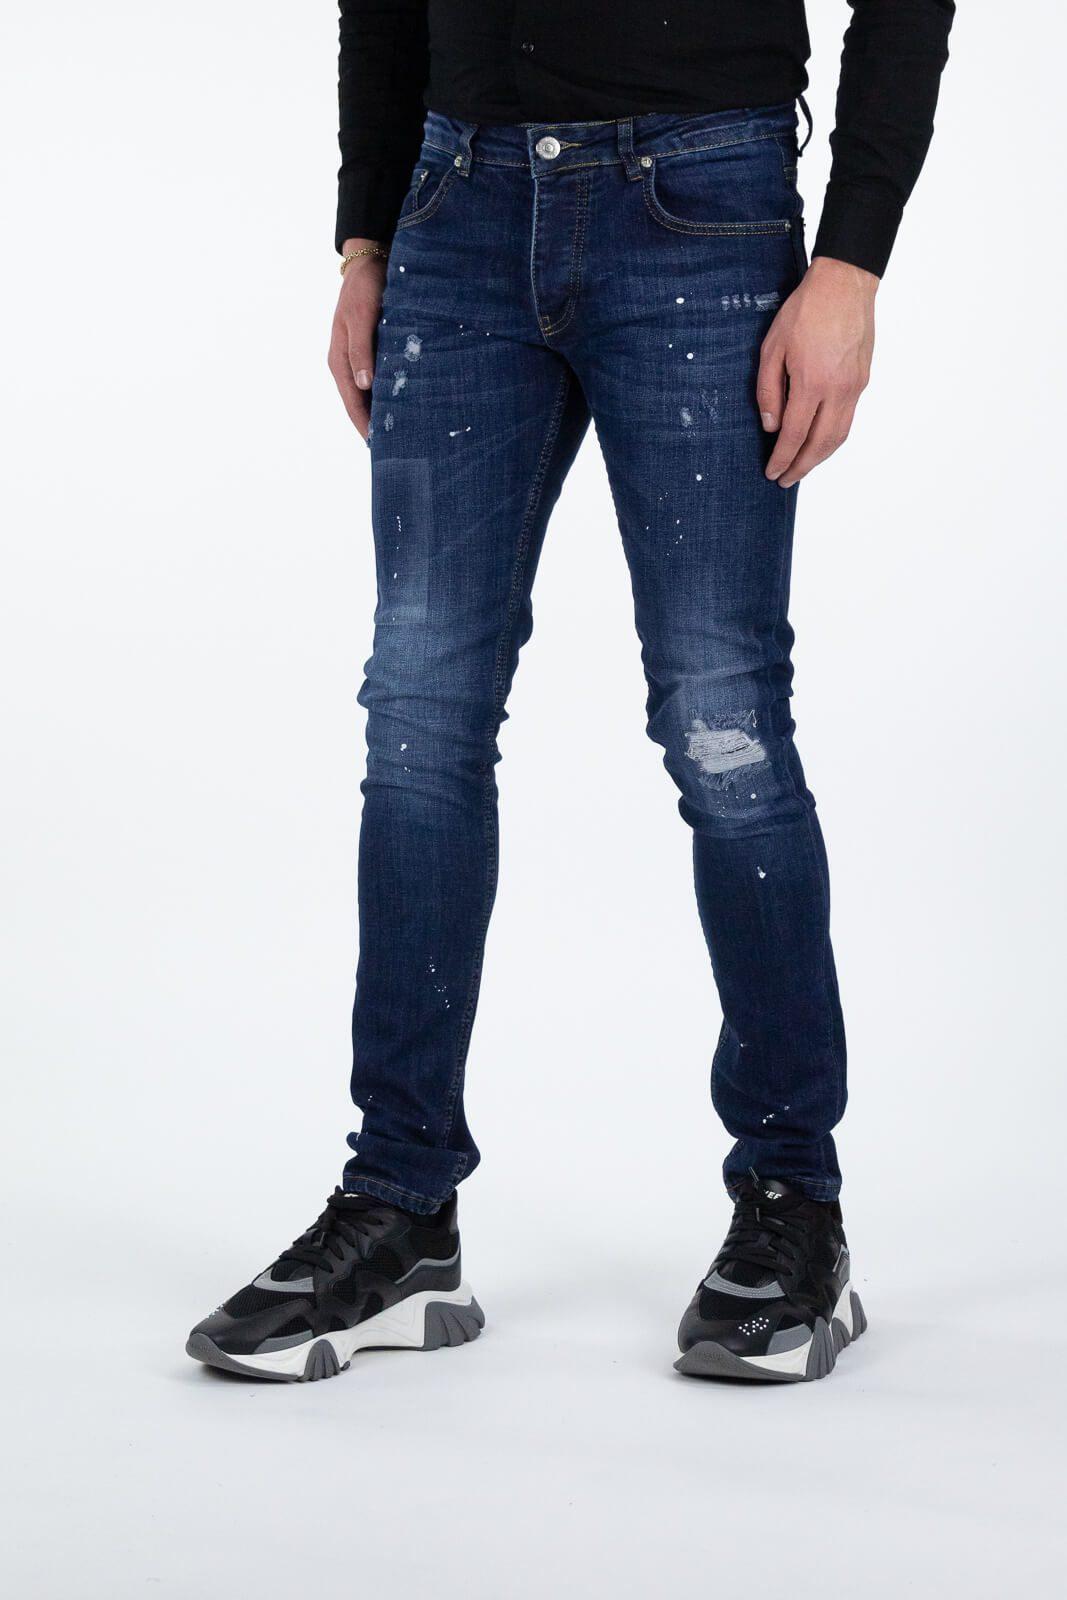 Talara Bleu Jeans-3